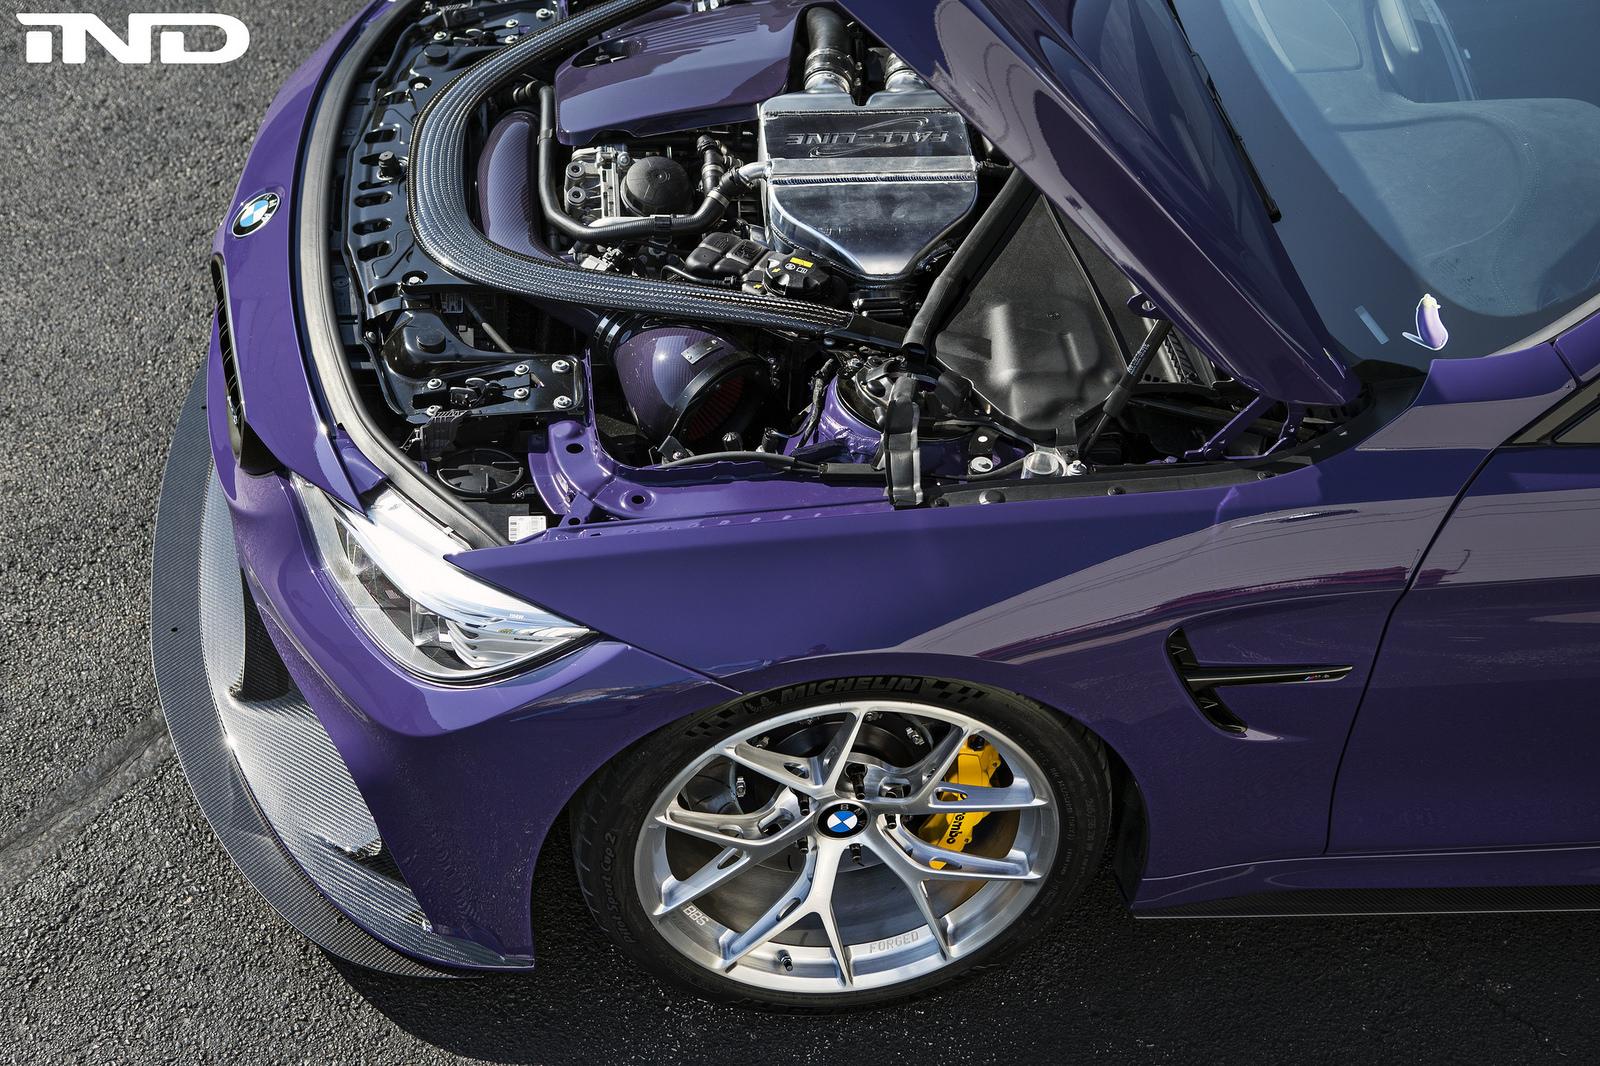 Stunning Purple BMW M4 Project Showcase 3